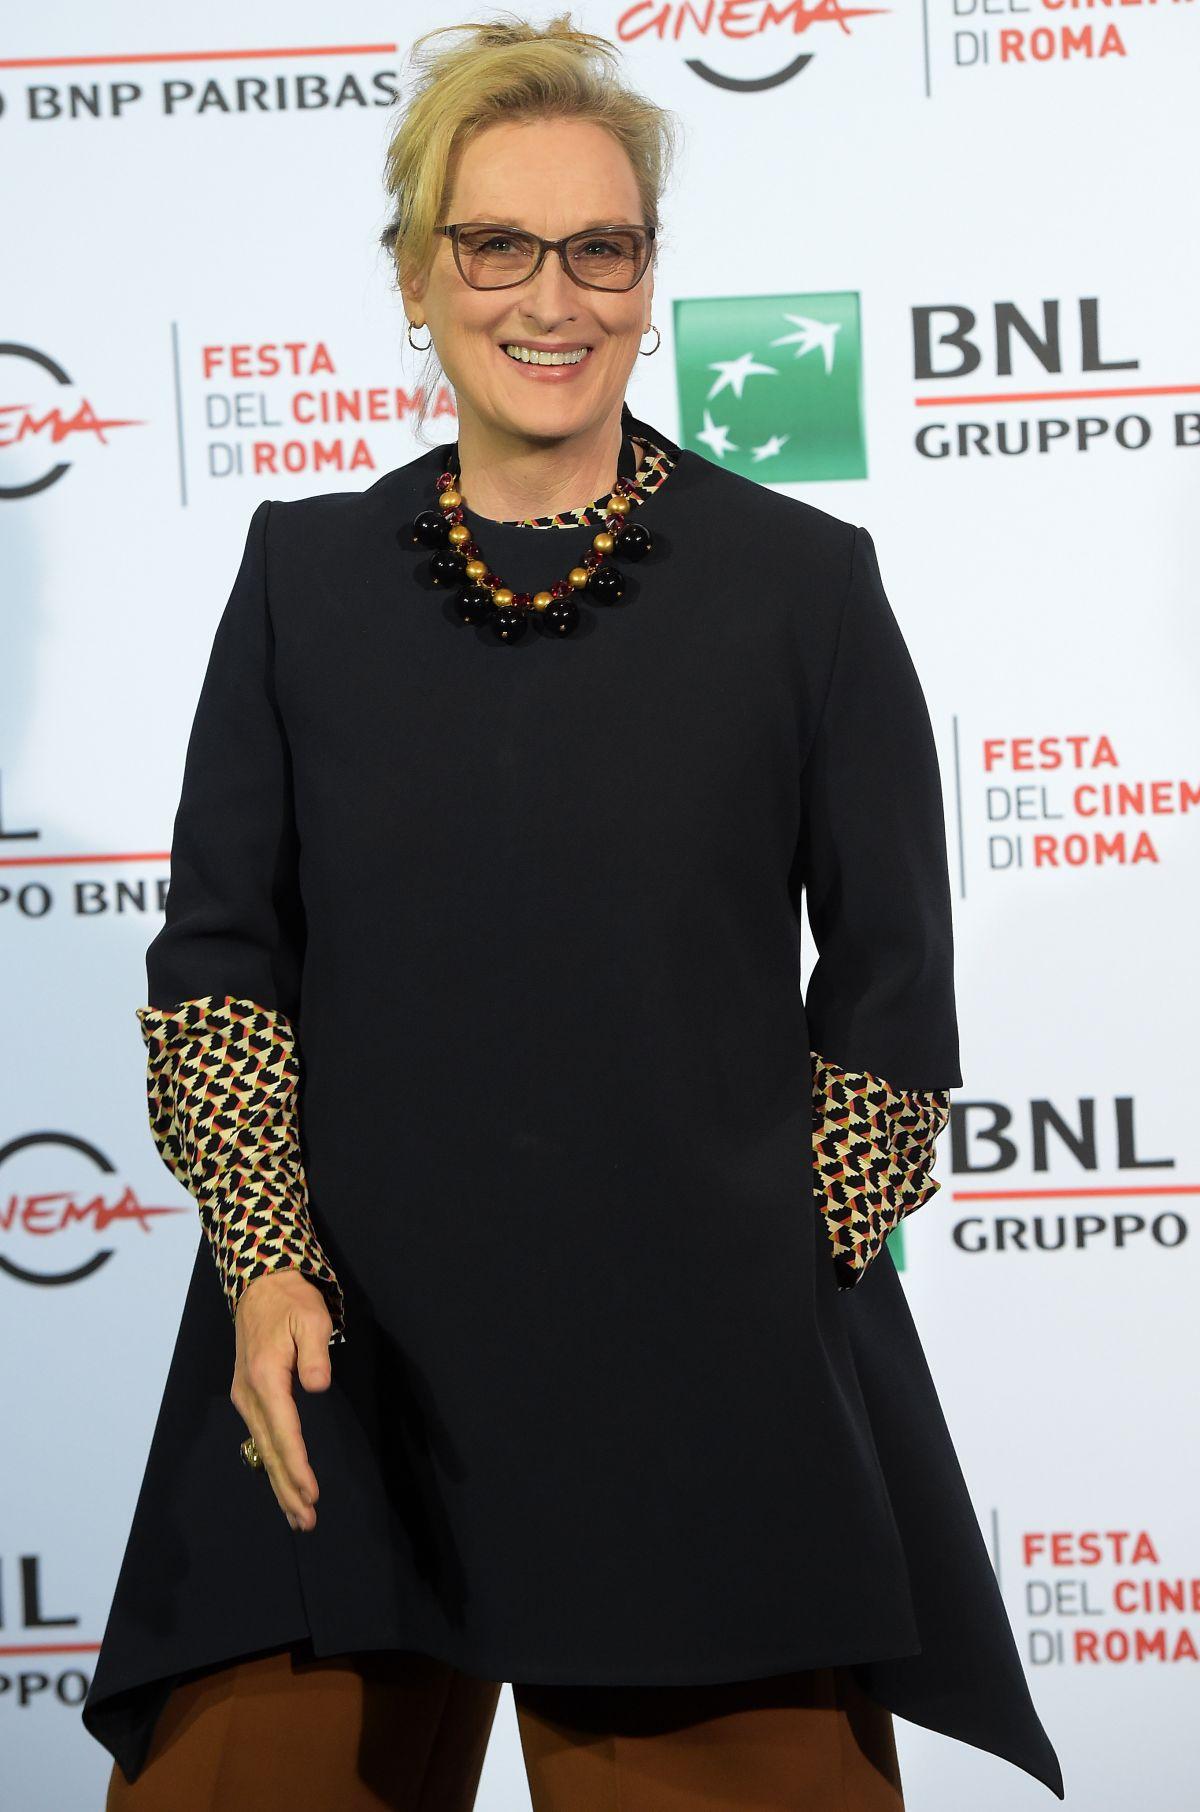 MERYL STREEP at Florence Foster Jenkins Rome Film Festival Premiere 10/20/2016